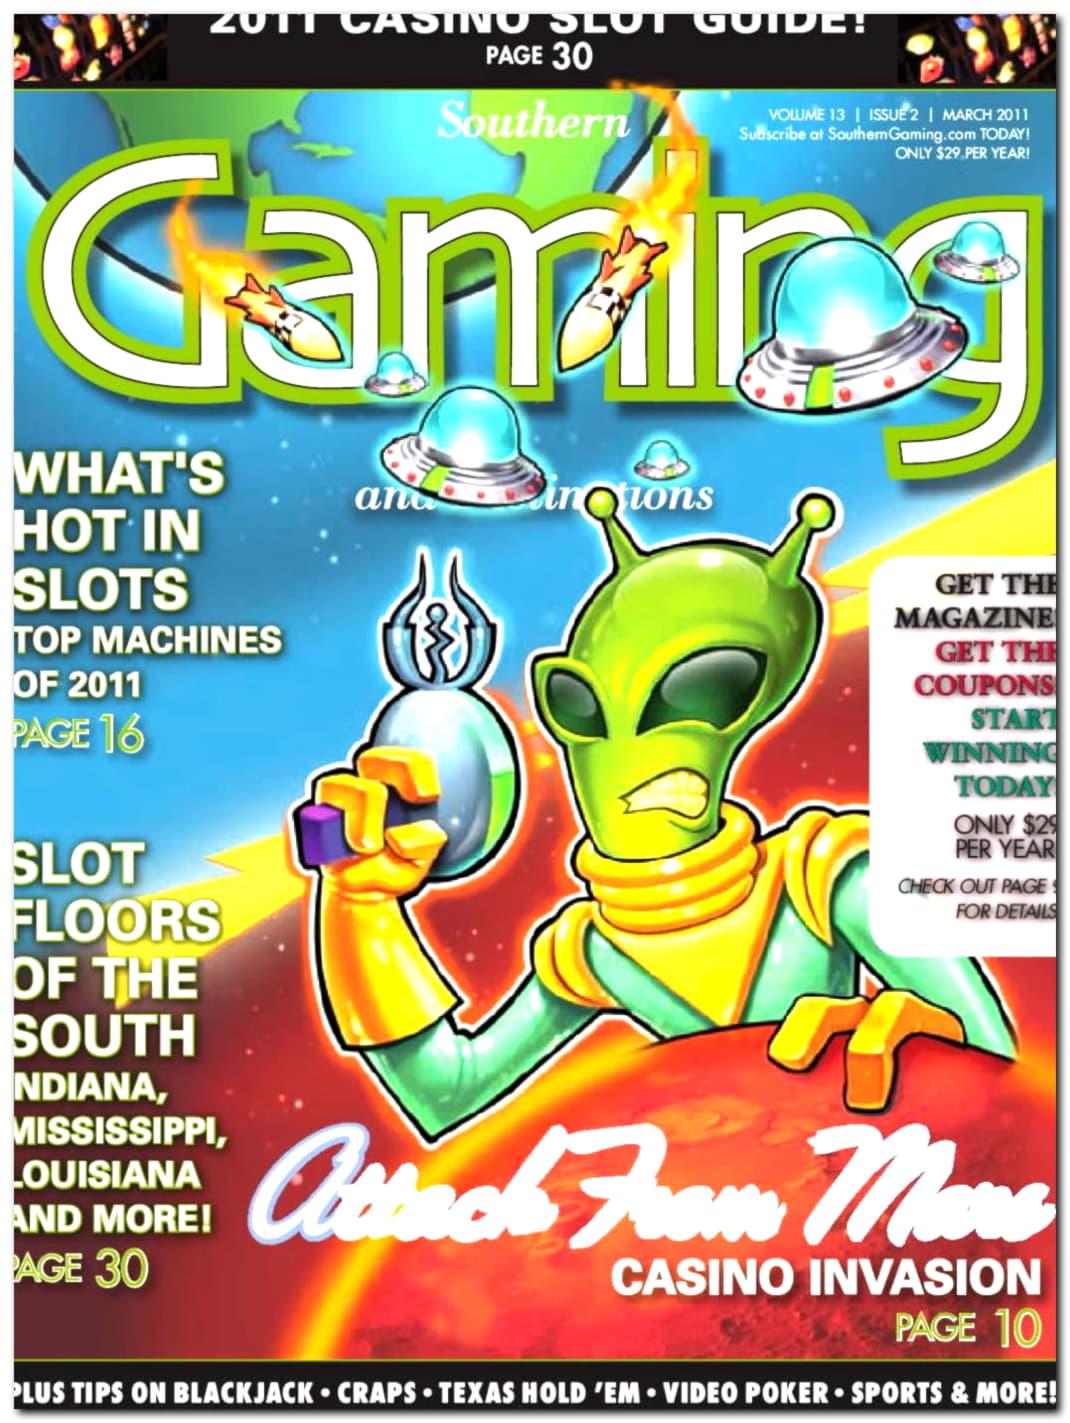 Buzzluck Casinoの€480オンラインカジノトーナメント